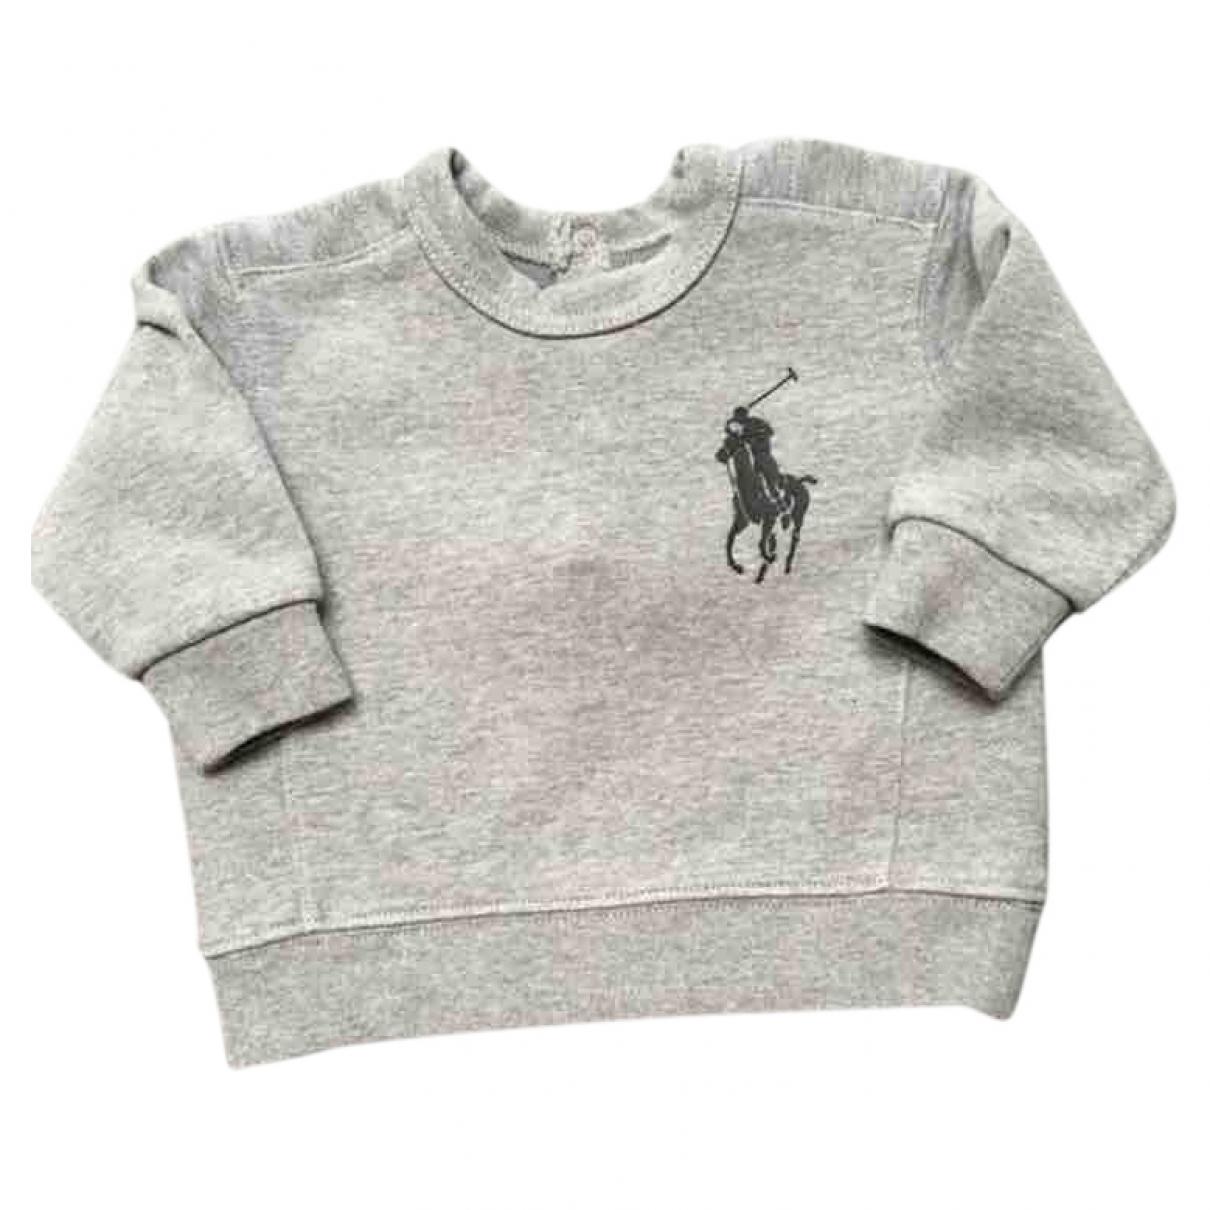 Ralph Lauren \N Grey Cotton Knitwear for Kids 6 months - up to 67cm FR